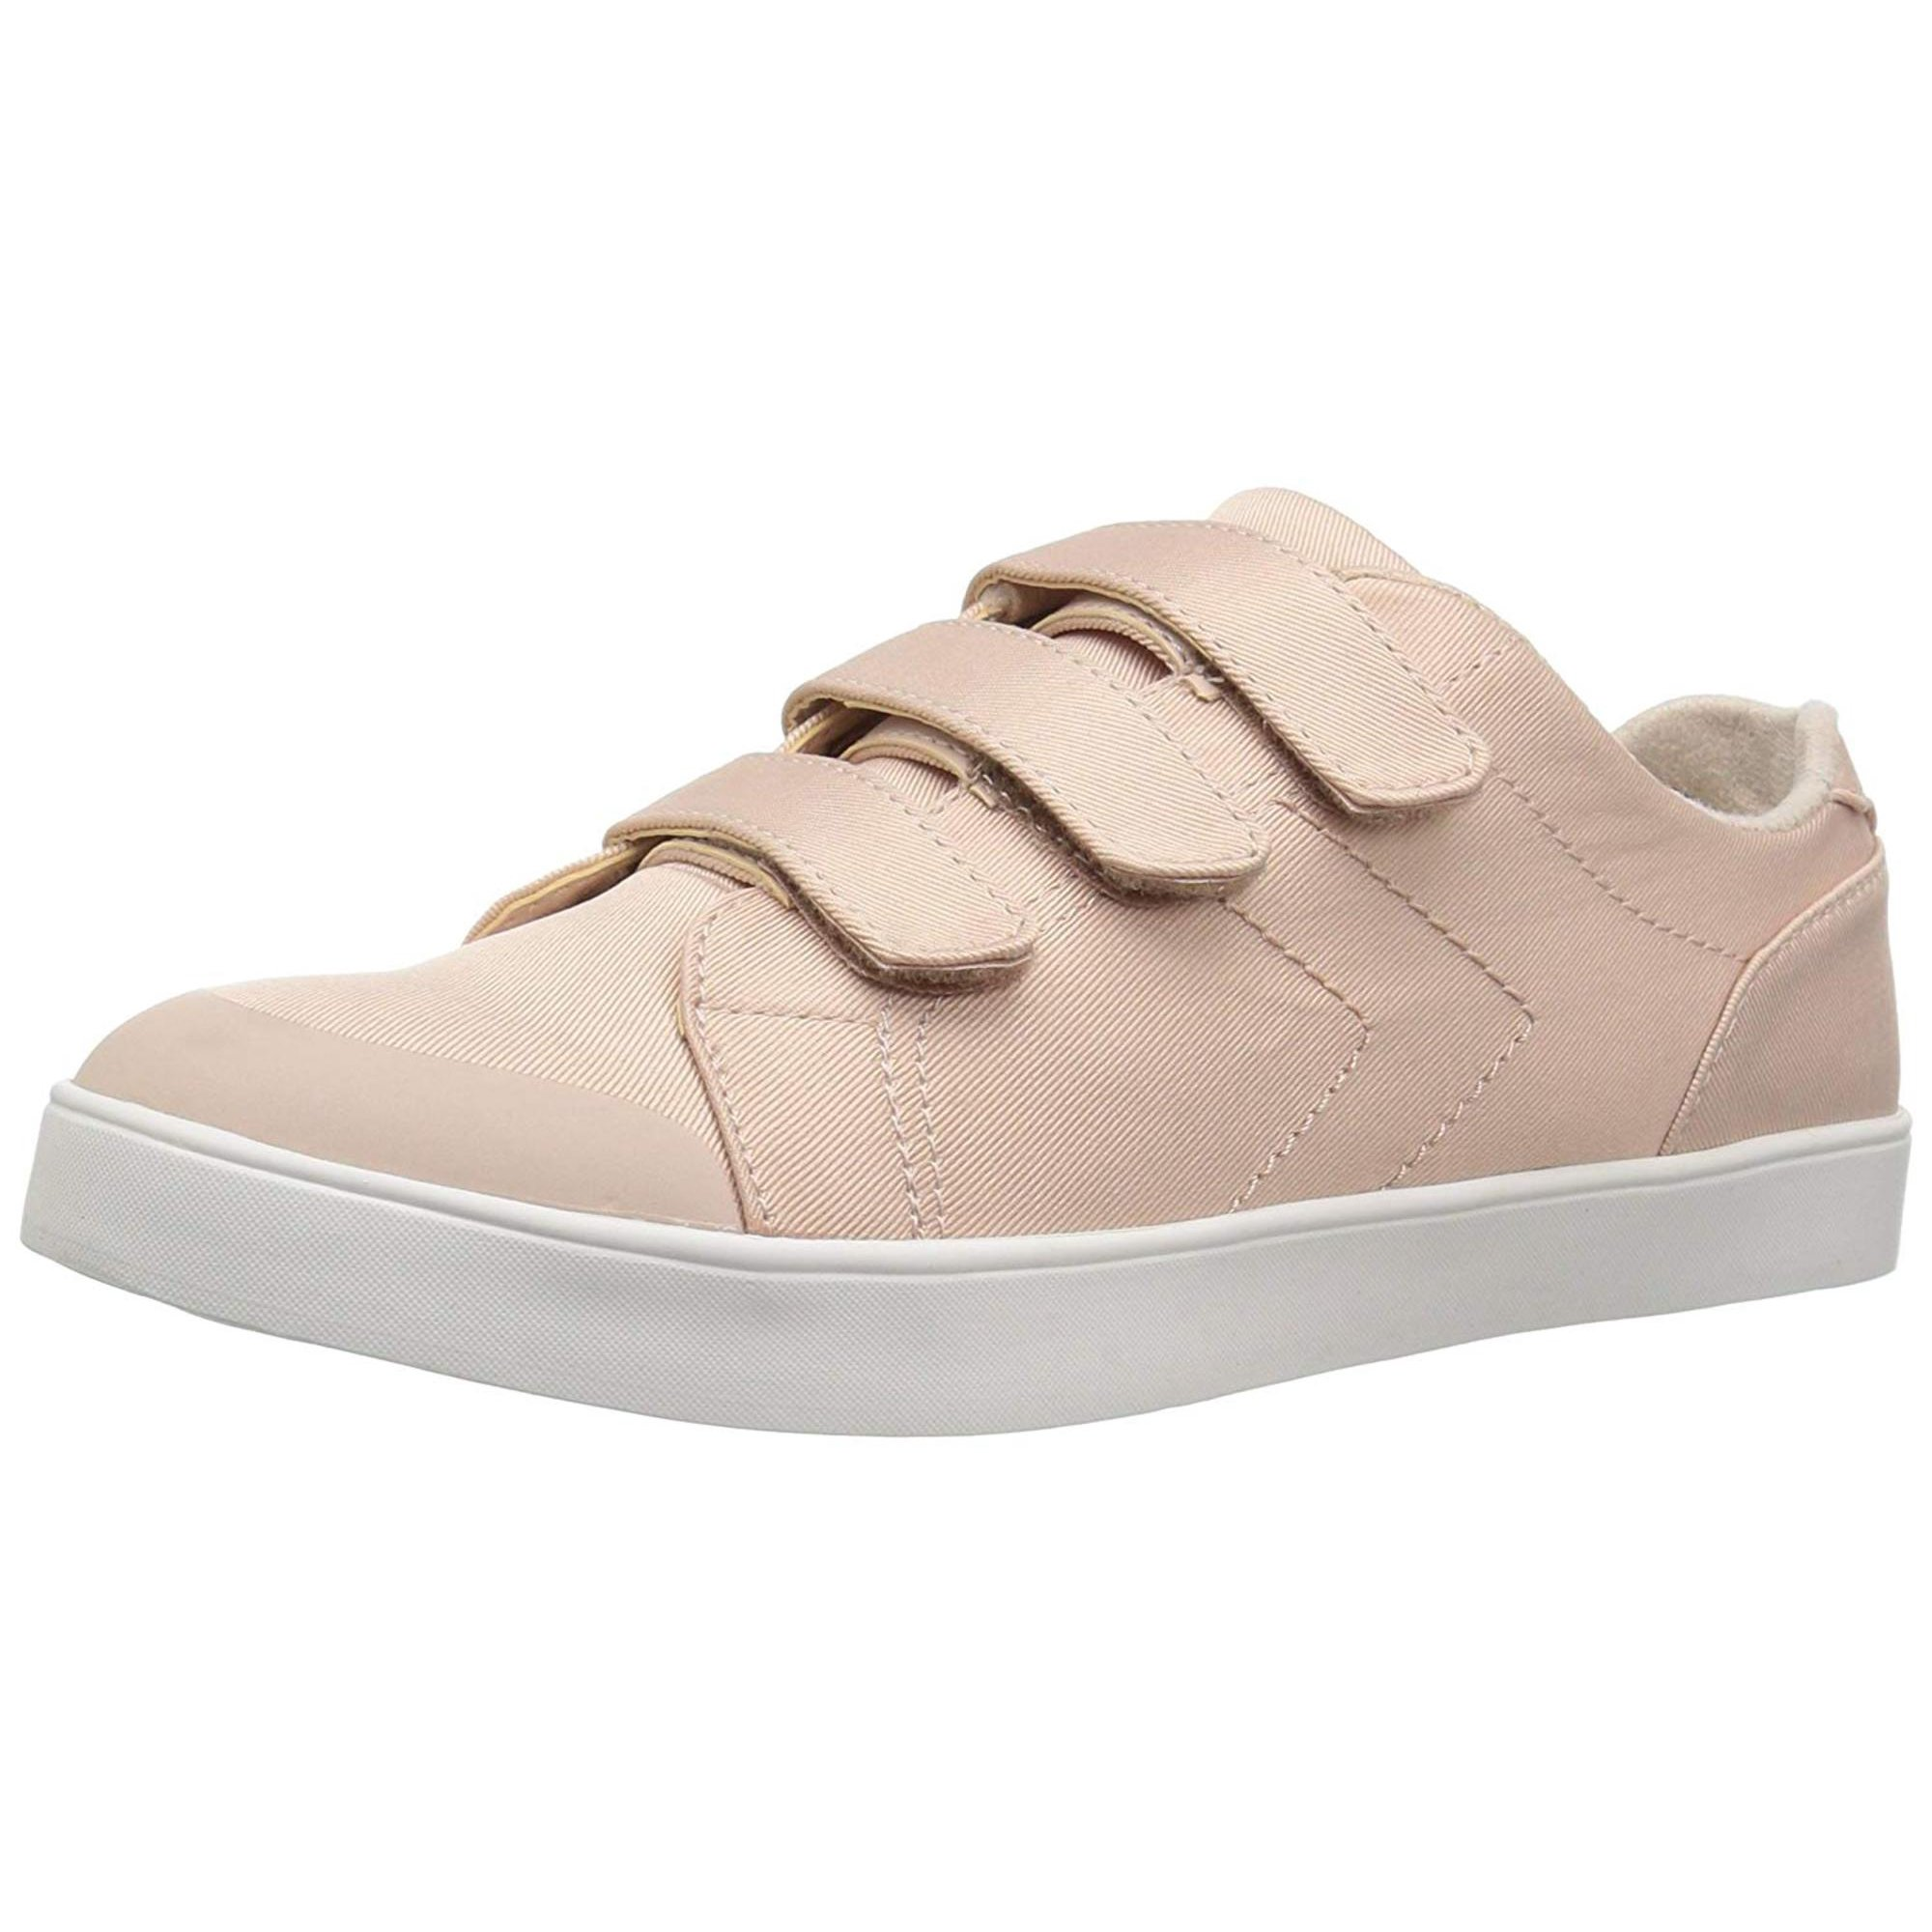 a8d8e60ea41a2 Dr. Scholl's Shoes Women's Madi Strap Sneaker | Walmart Canada